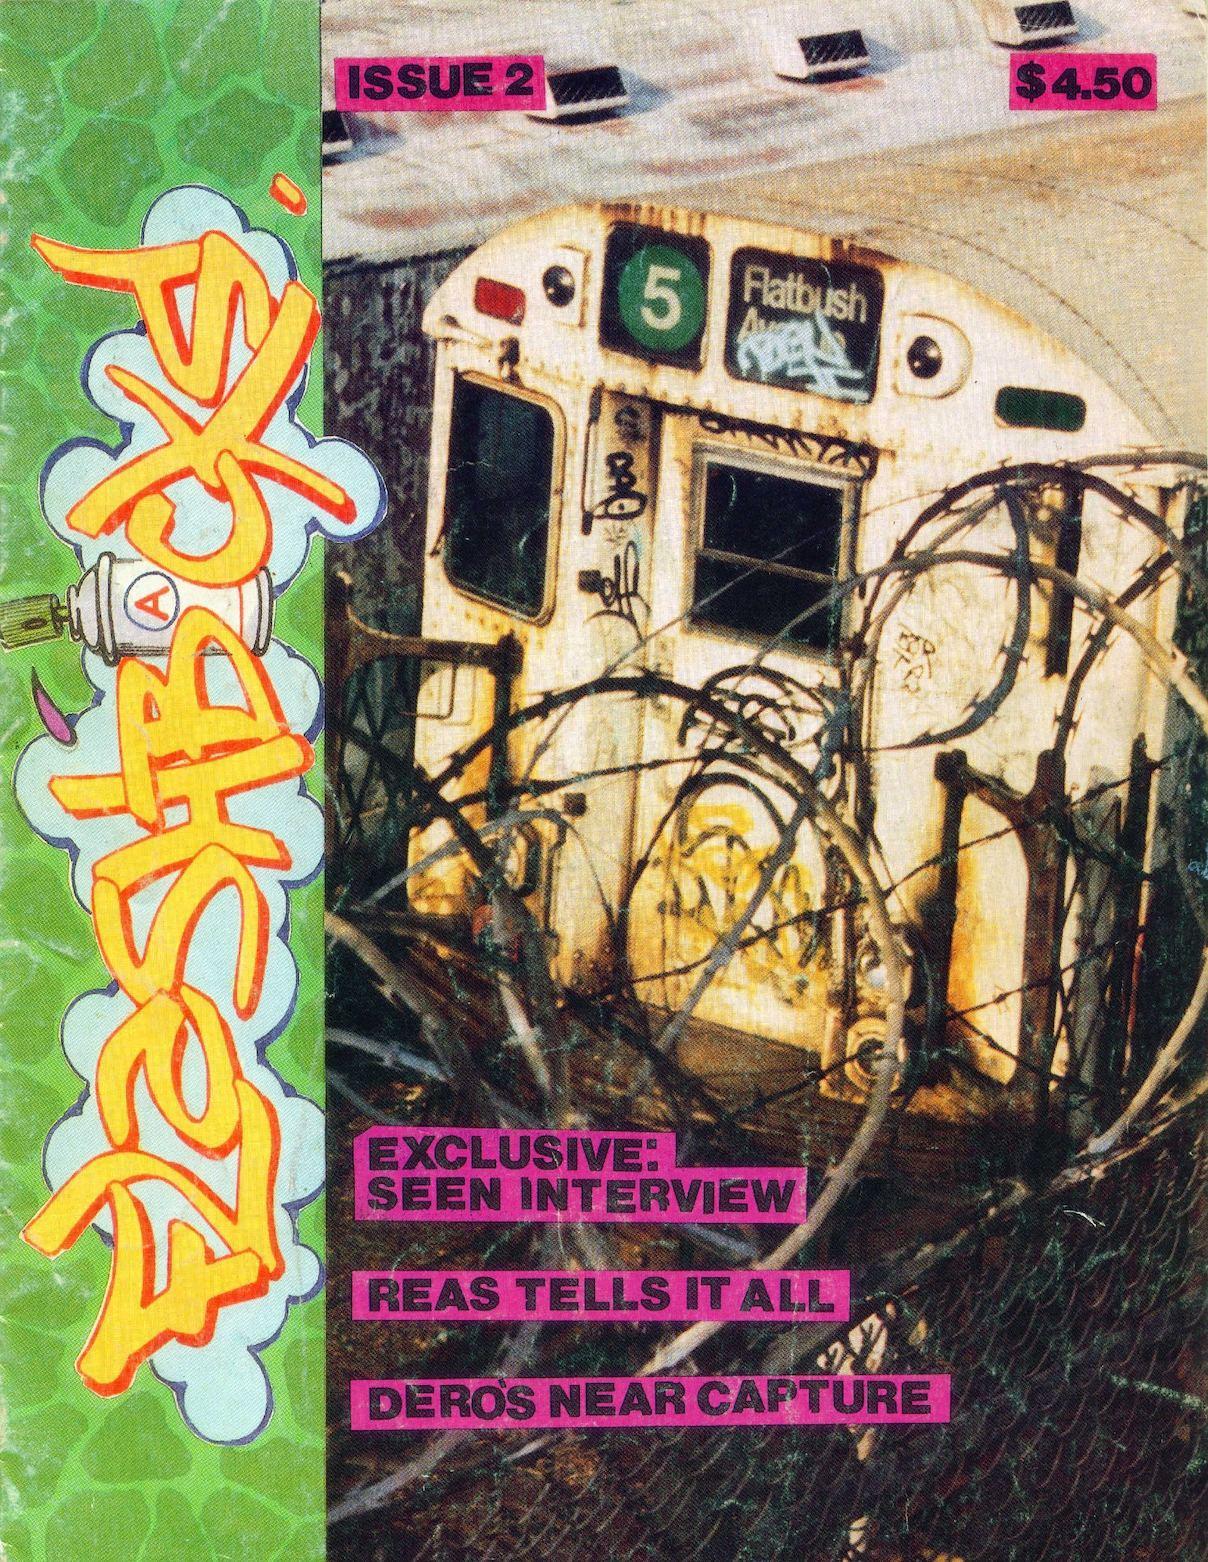 Flashbacks / Graffiti Magazine (Issue 2)